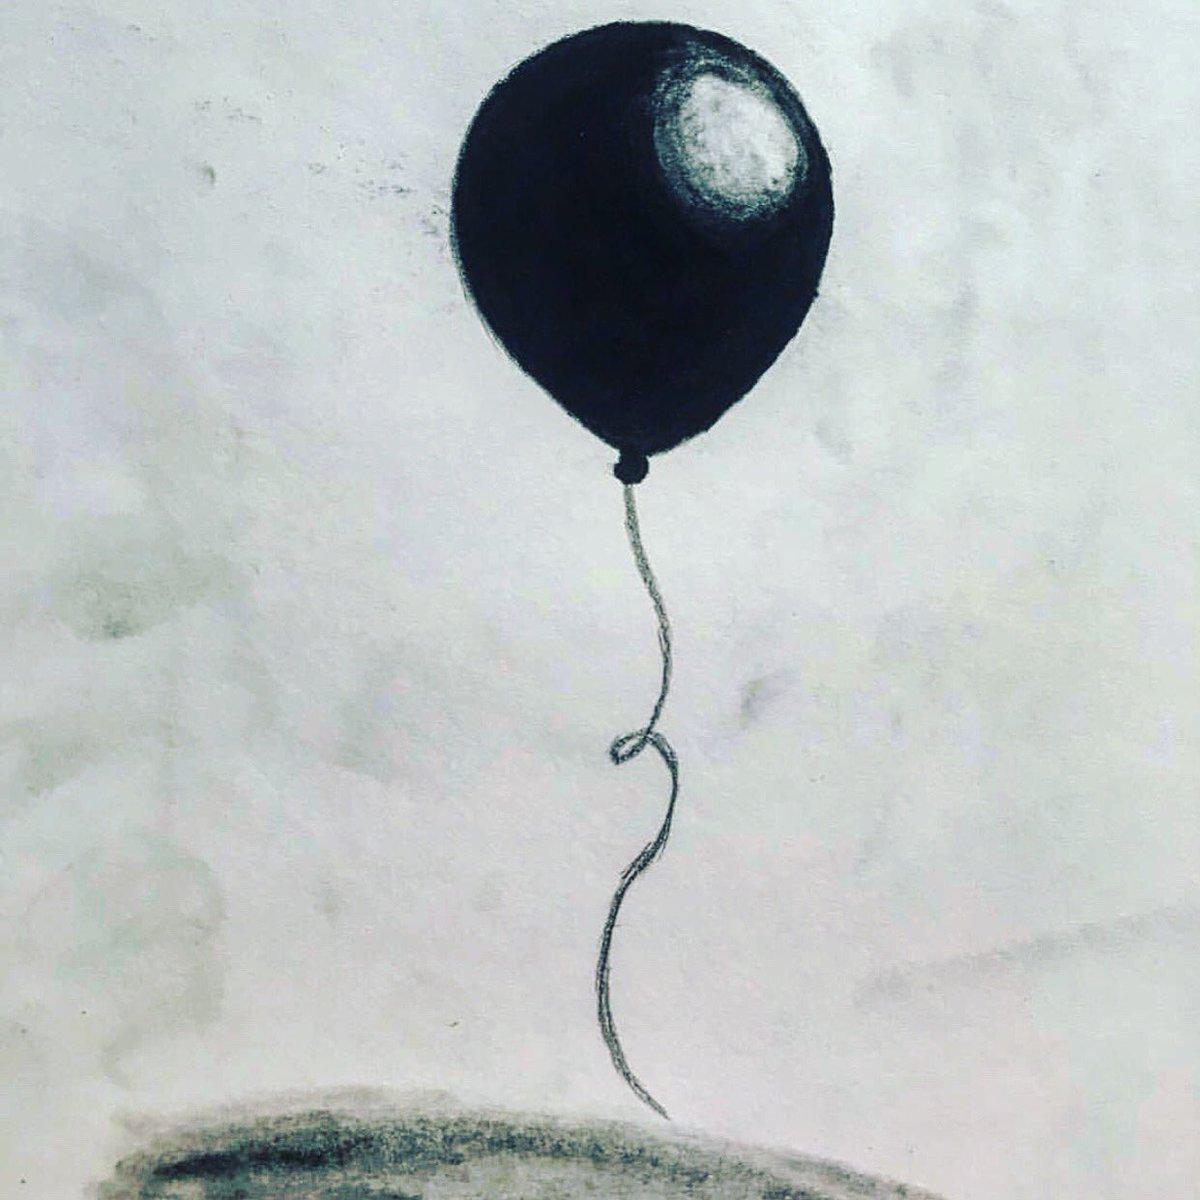 Kills - Black Balloon Lyrics   MetroLyrics